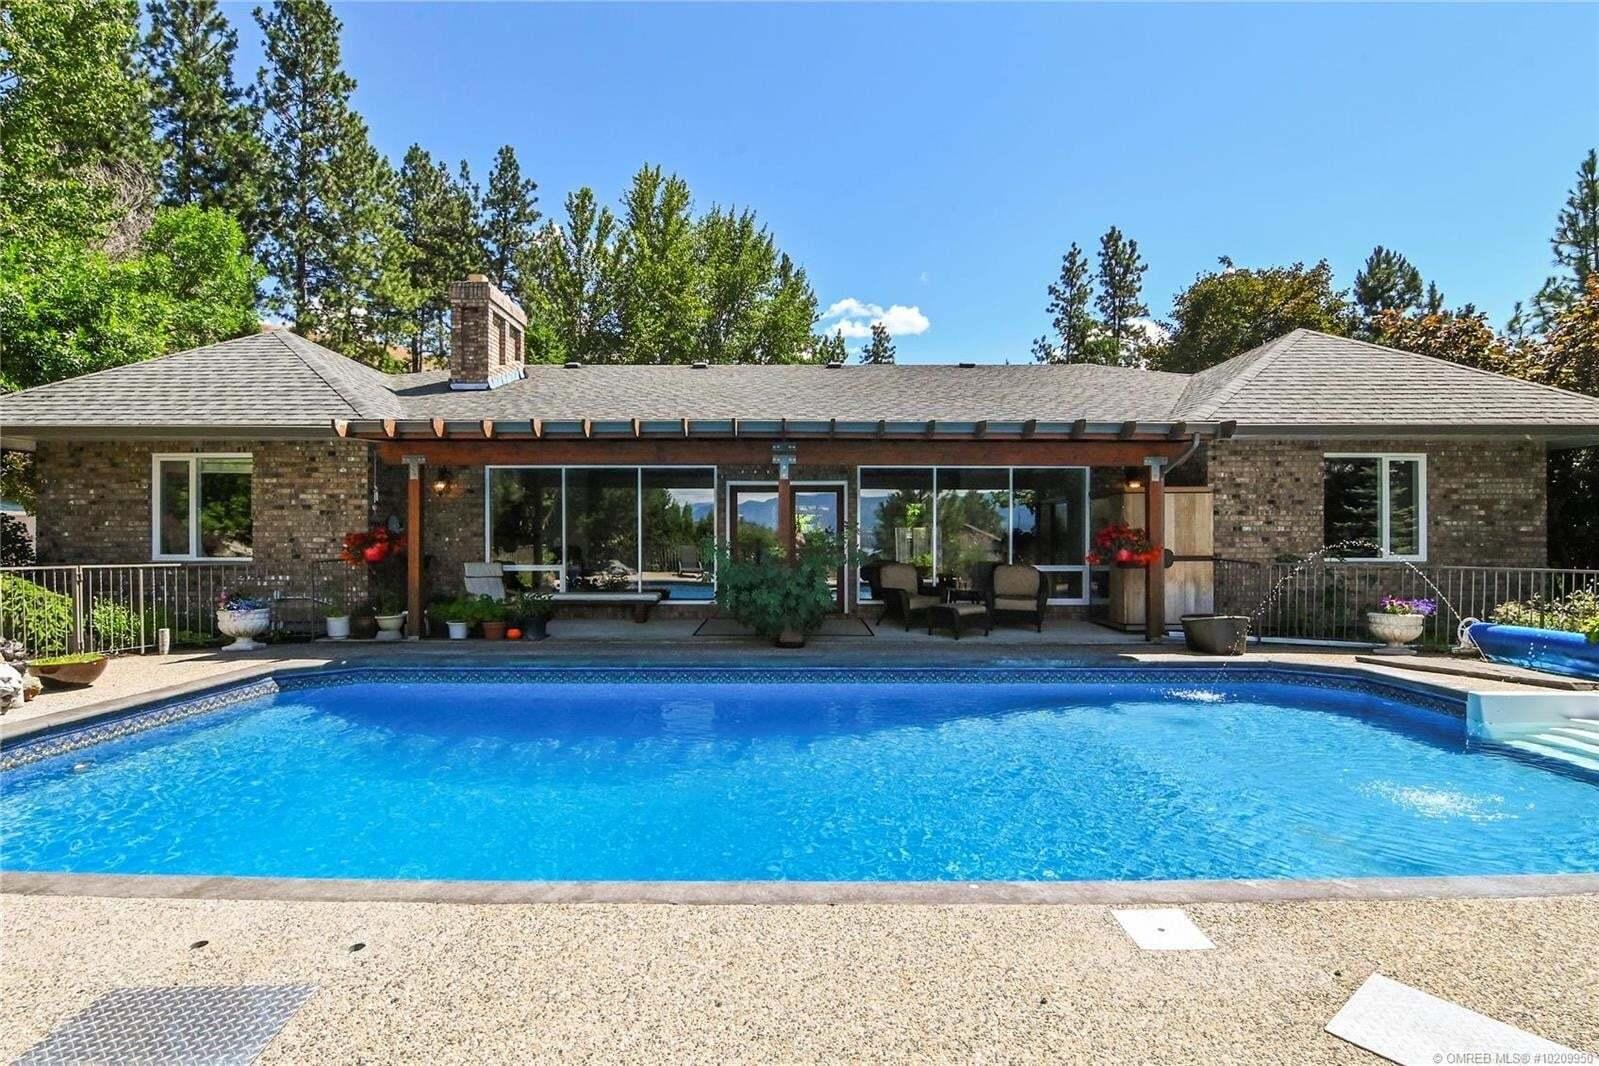 House for sale at 514 Hawes Ct Kelowna British Columbia - MLS: 10209950